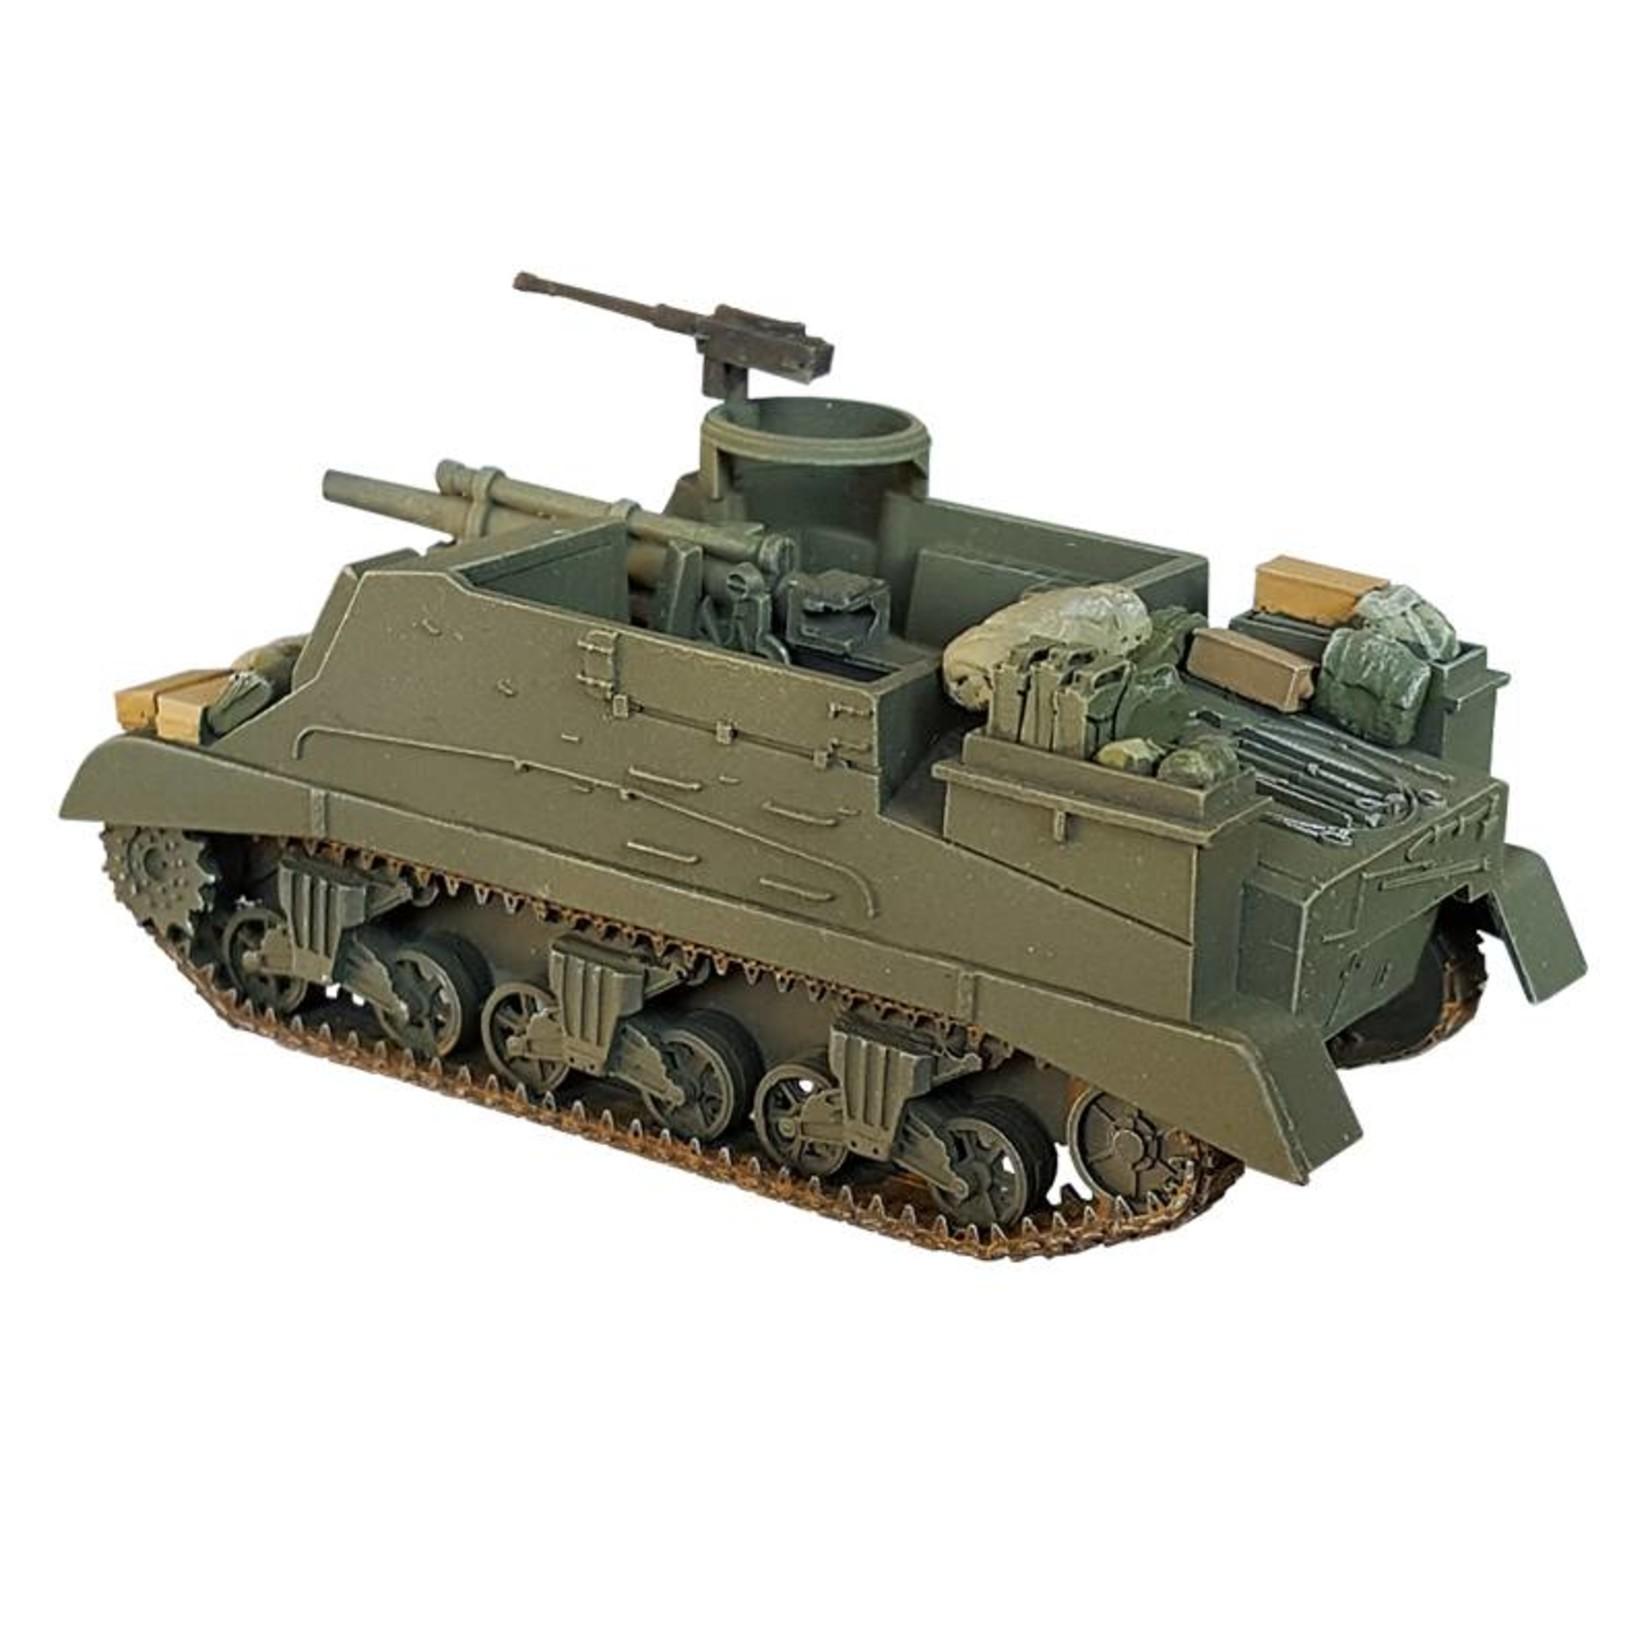 M7 Priest 105mm Howitzer